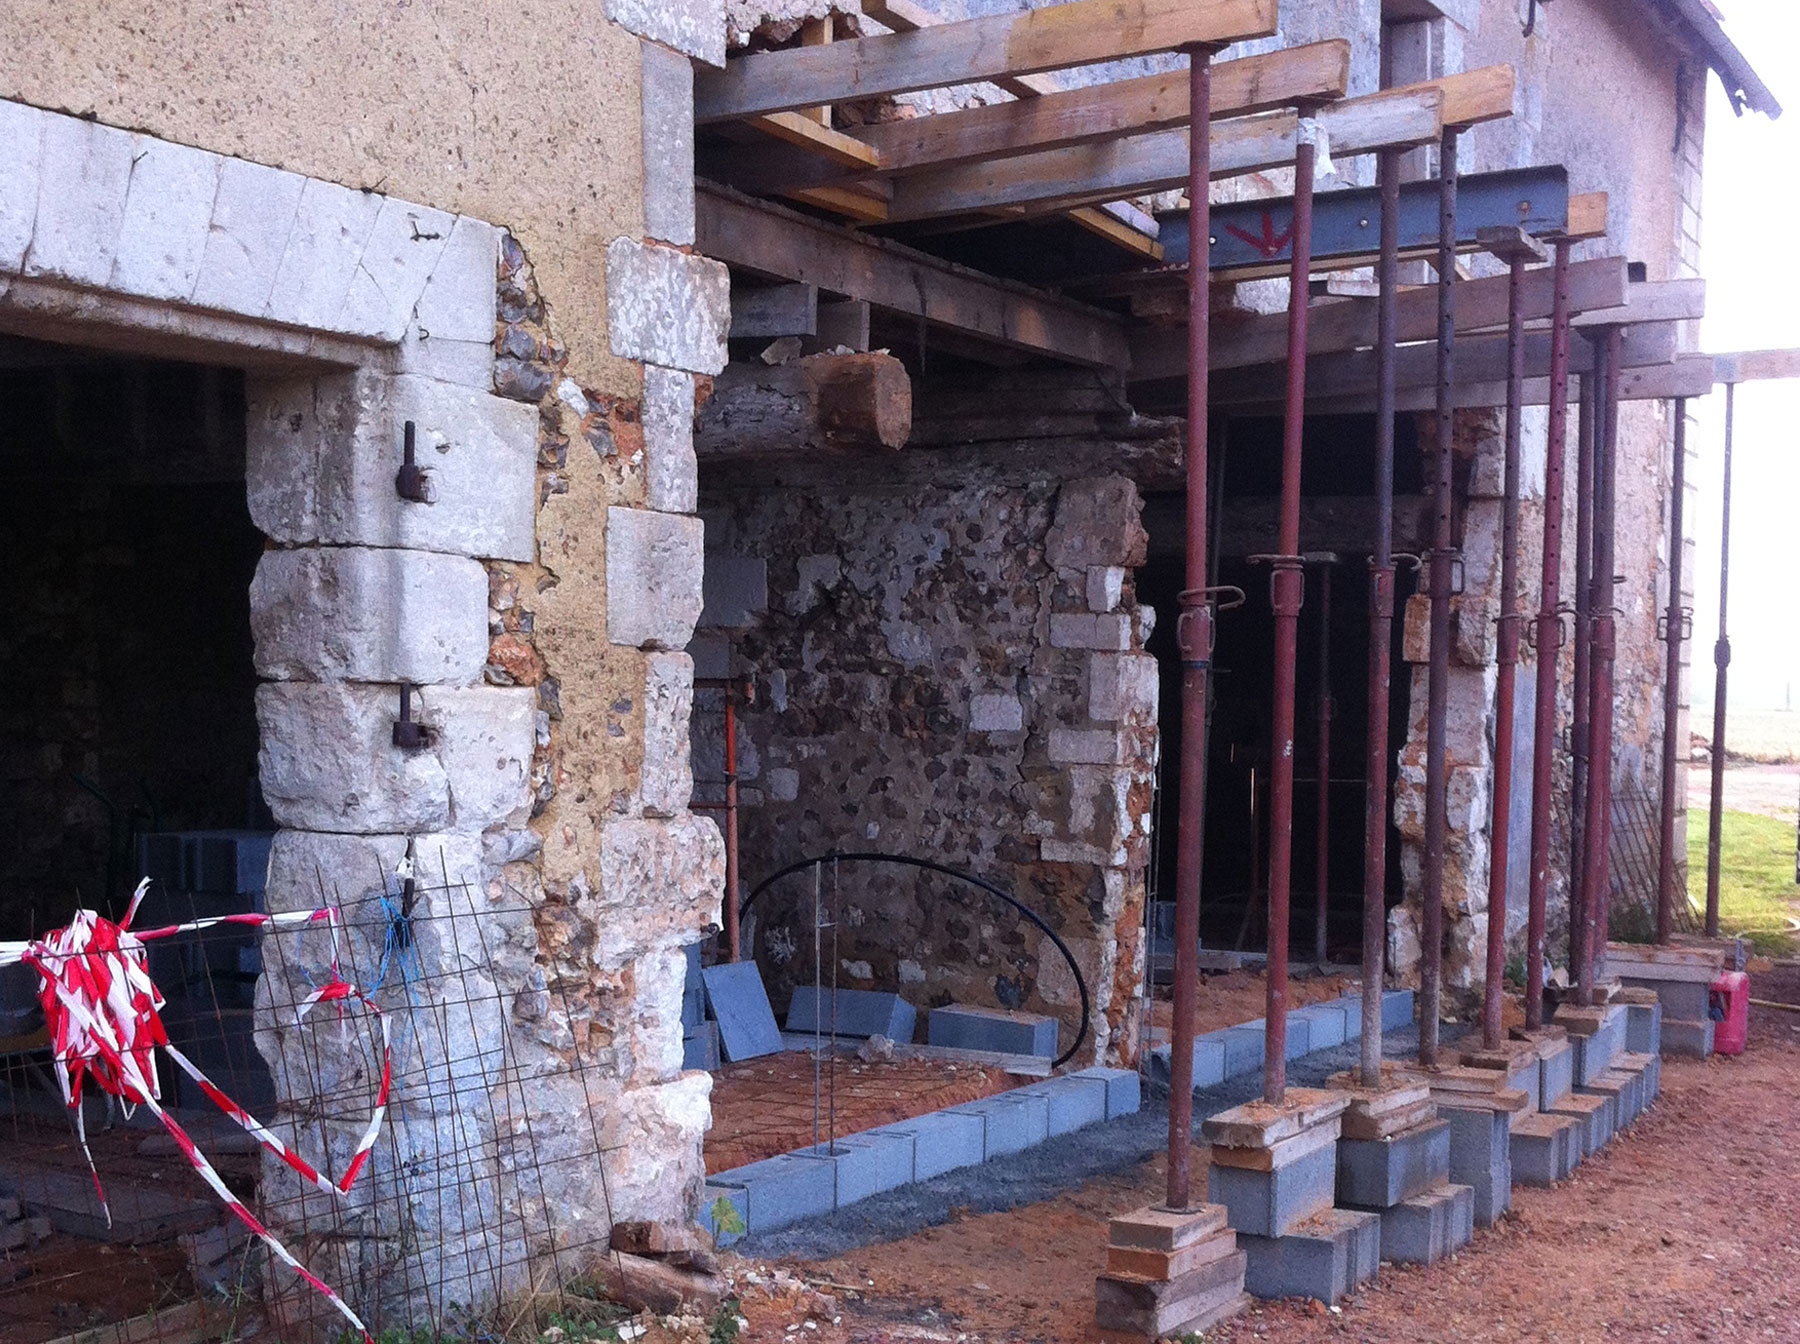 Un mur interne permet de consolider la future structure